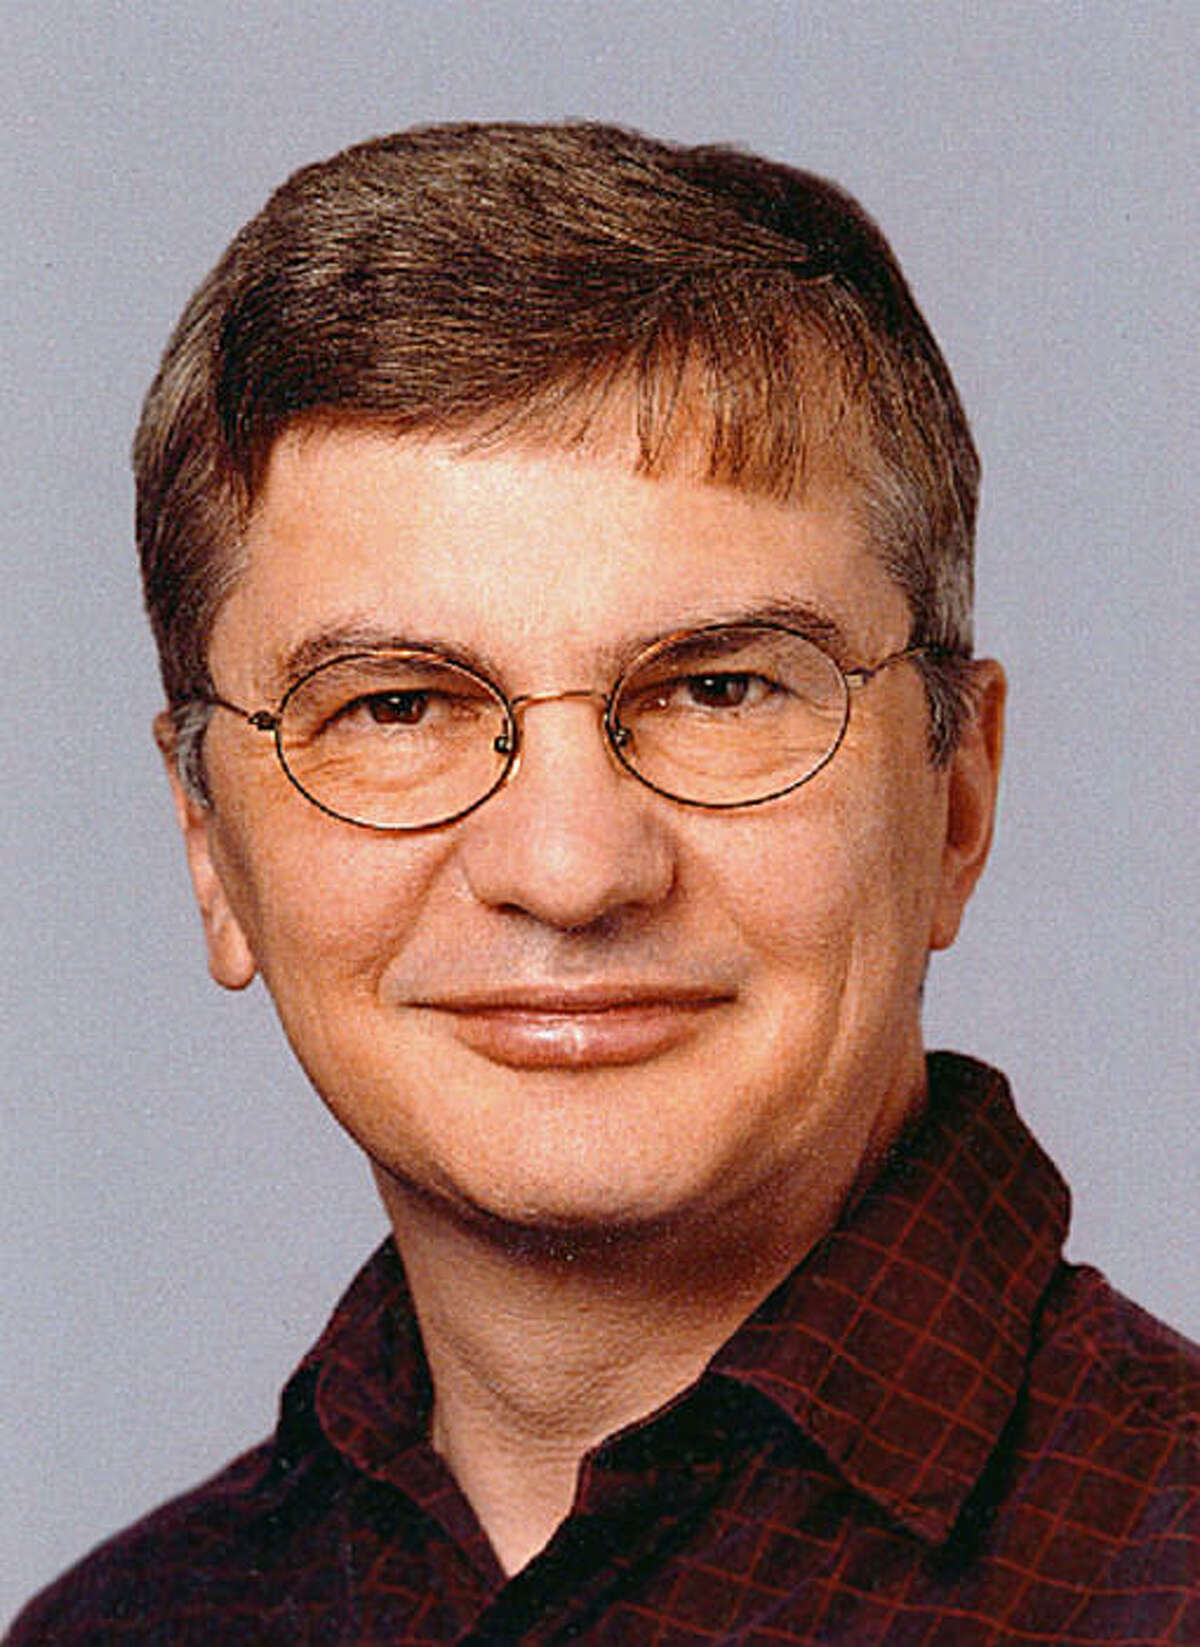 Napoleone Ferrara won the Lasker Award.